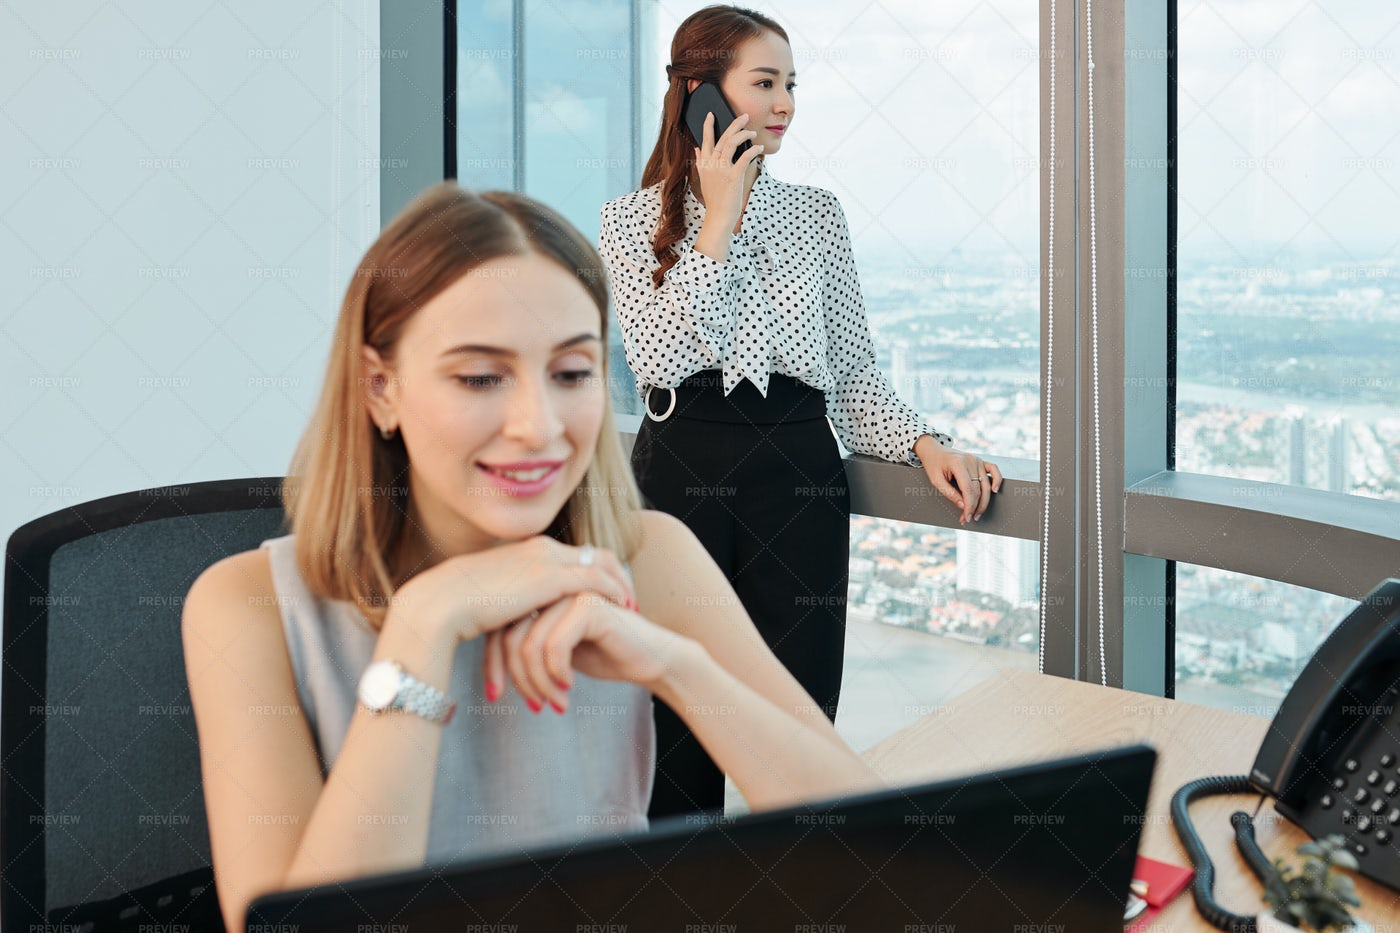 Pesive Businesswoman Talking On Phone: Stock Photos